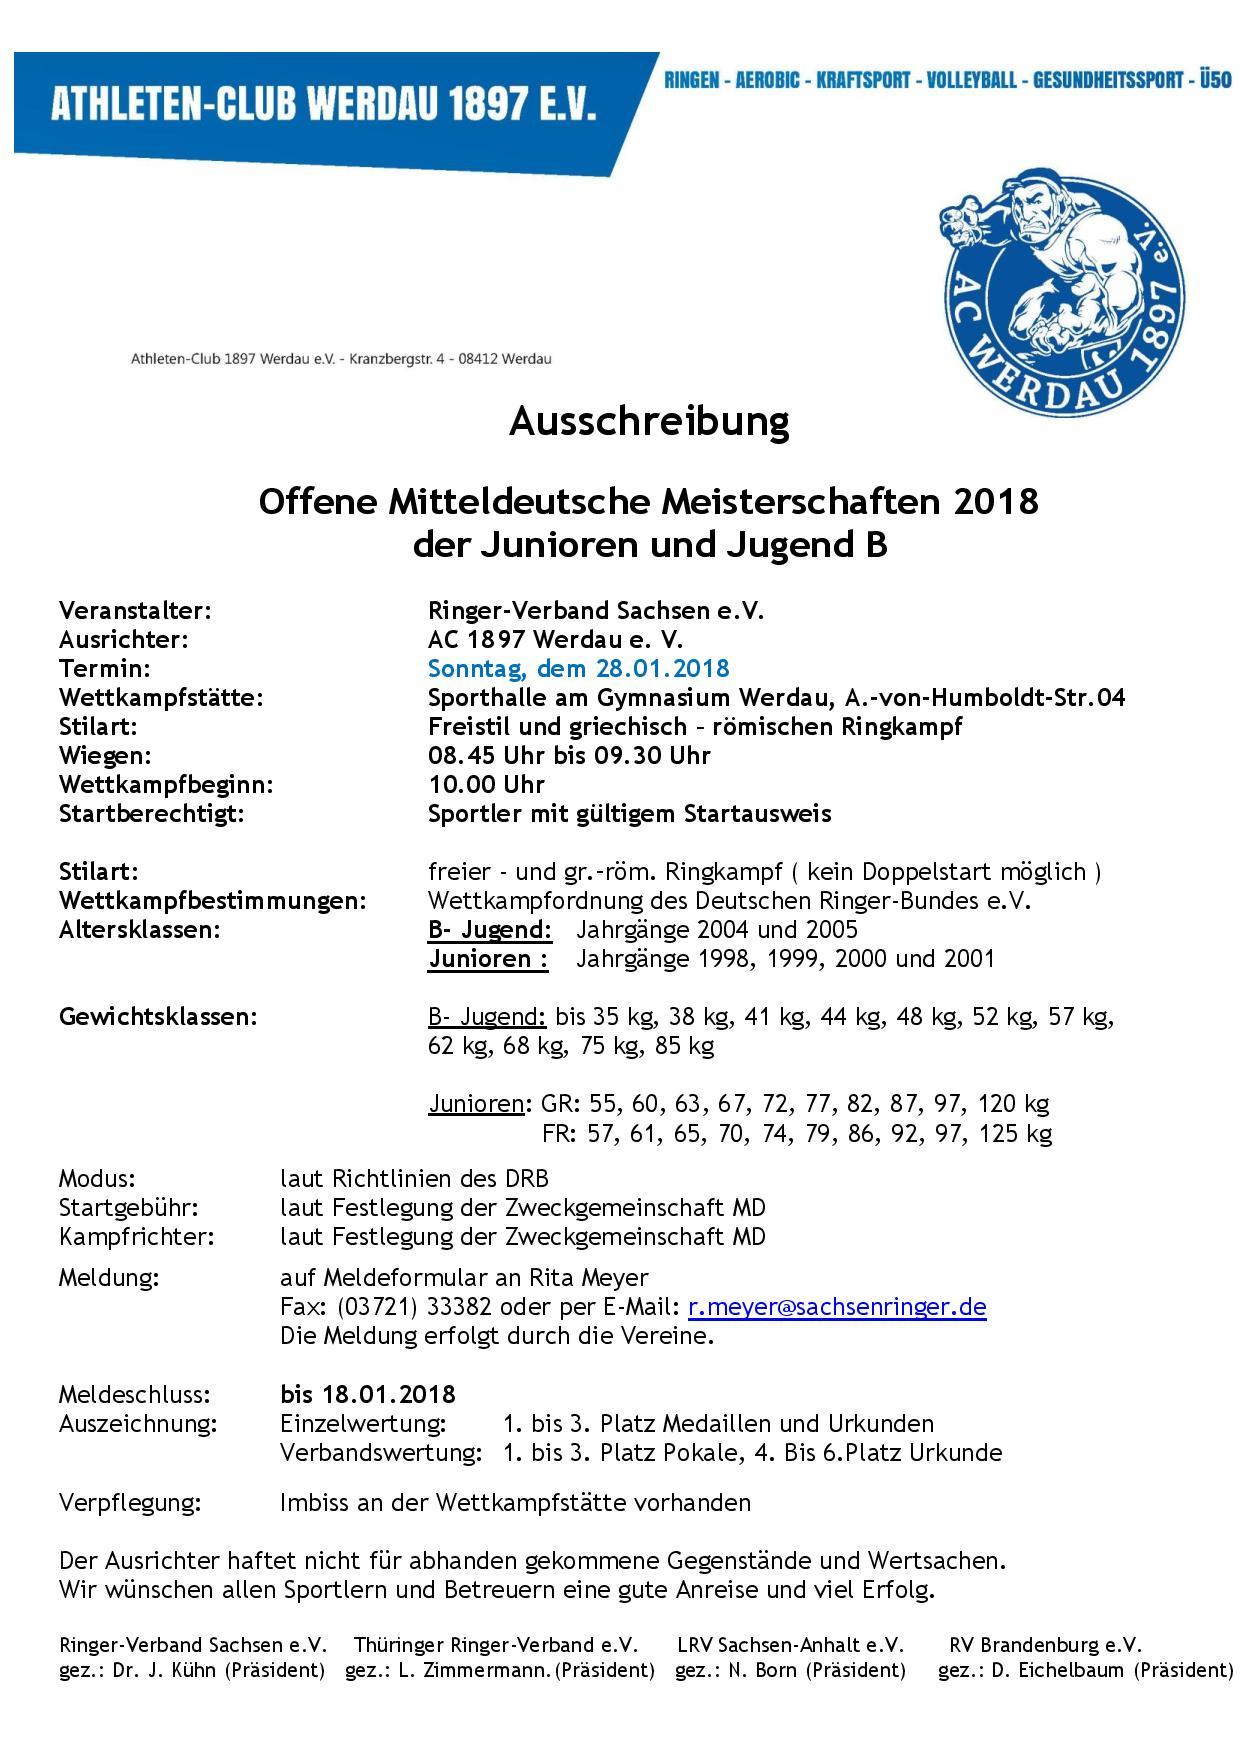 Offene Mitteldeutsche Meisterschaft Junioren/ Jugend B FR+GR